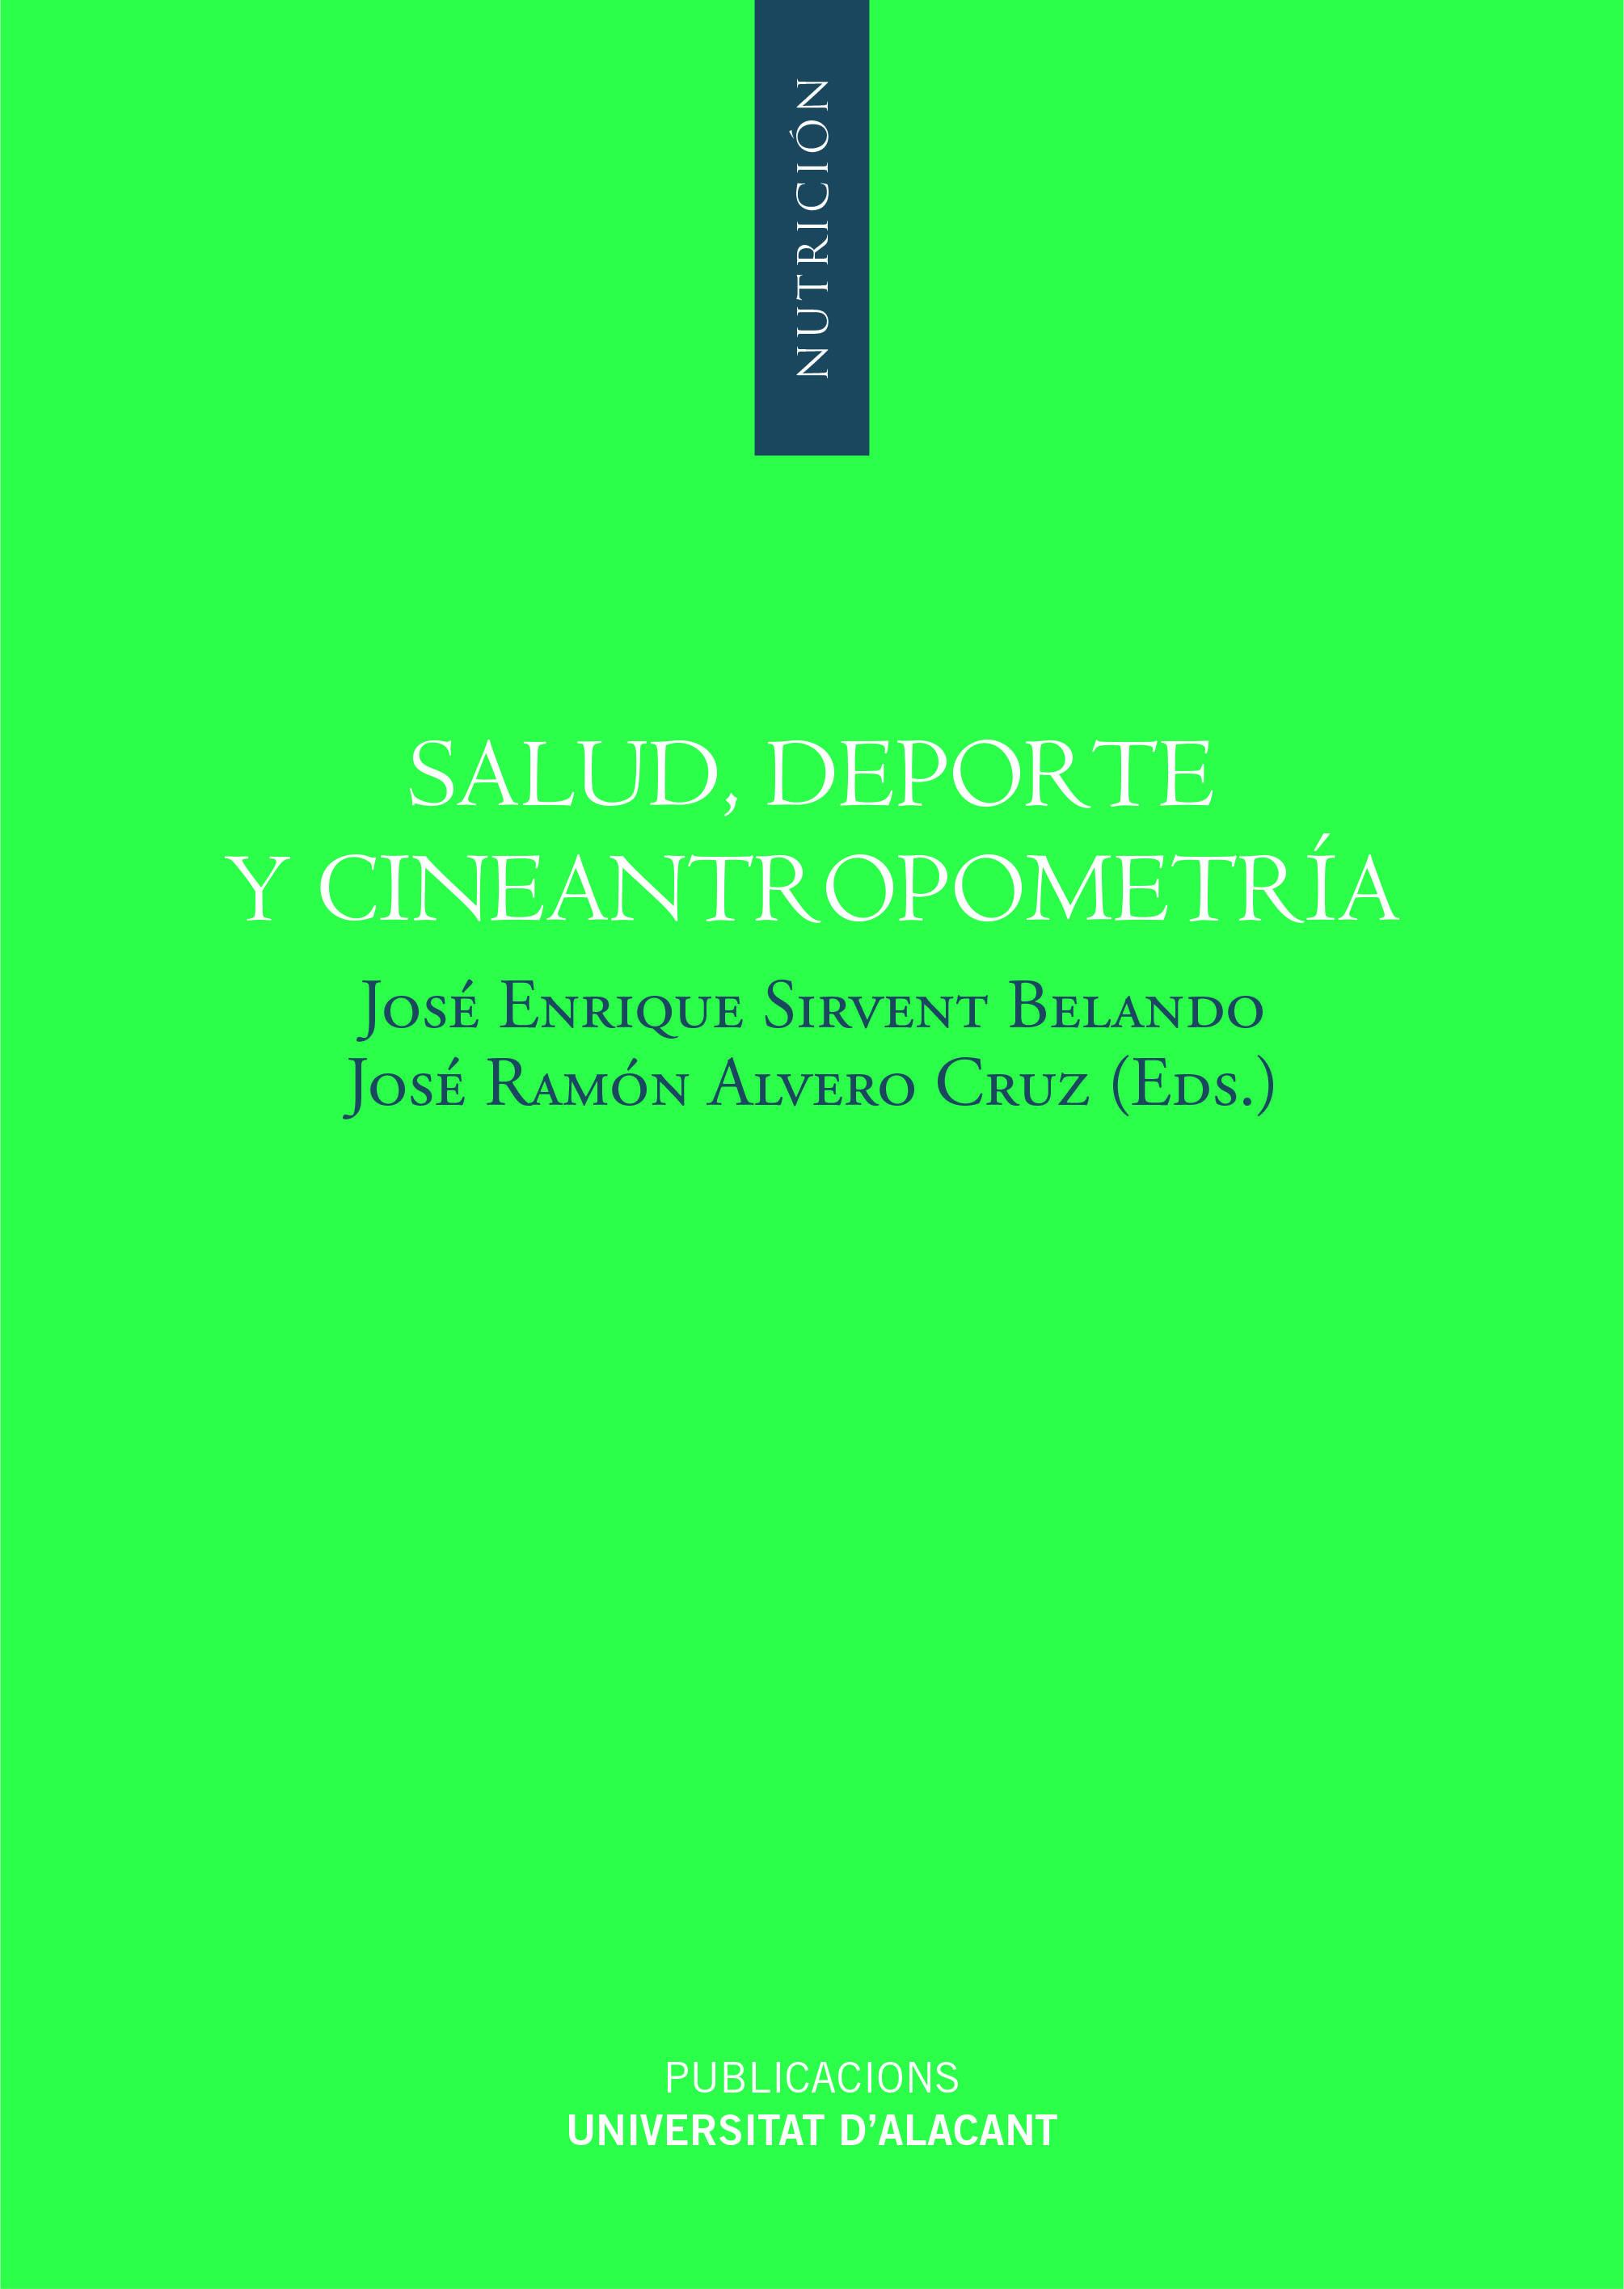 SALUD, DEPORTE Y CINEANTROPOMETRIA